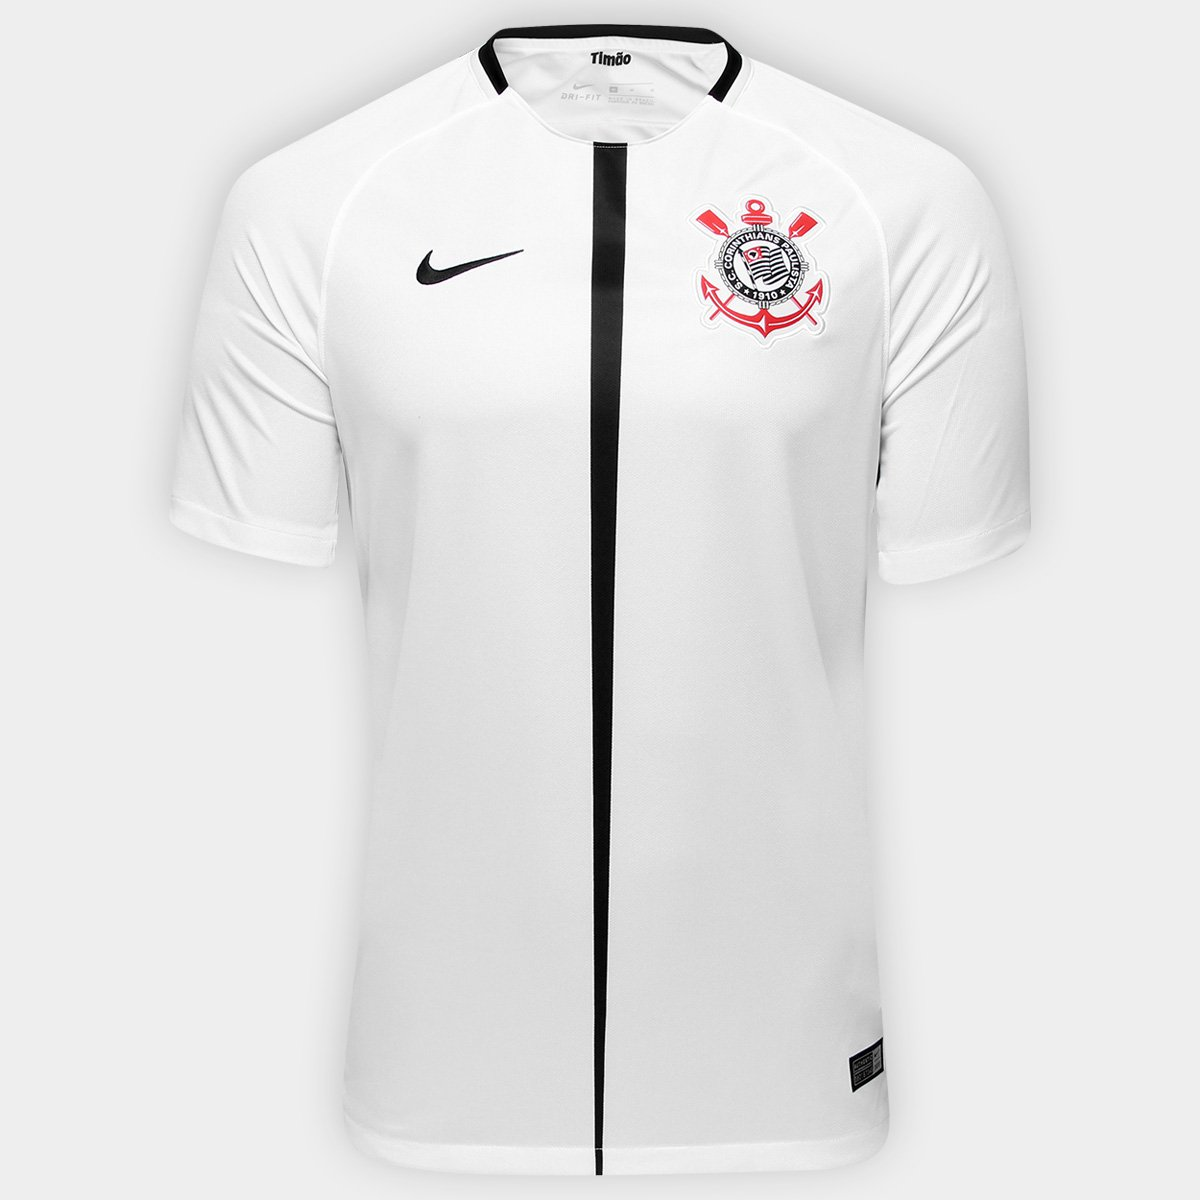 453edcd409 Camisa Corinthians I 17 18 s nº Torcedor Nike Masculina